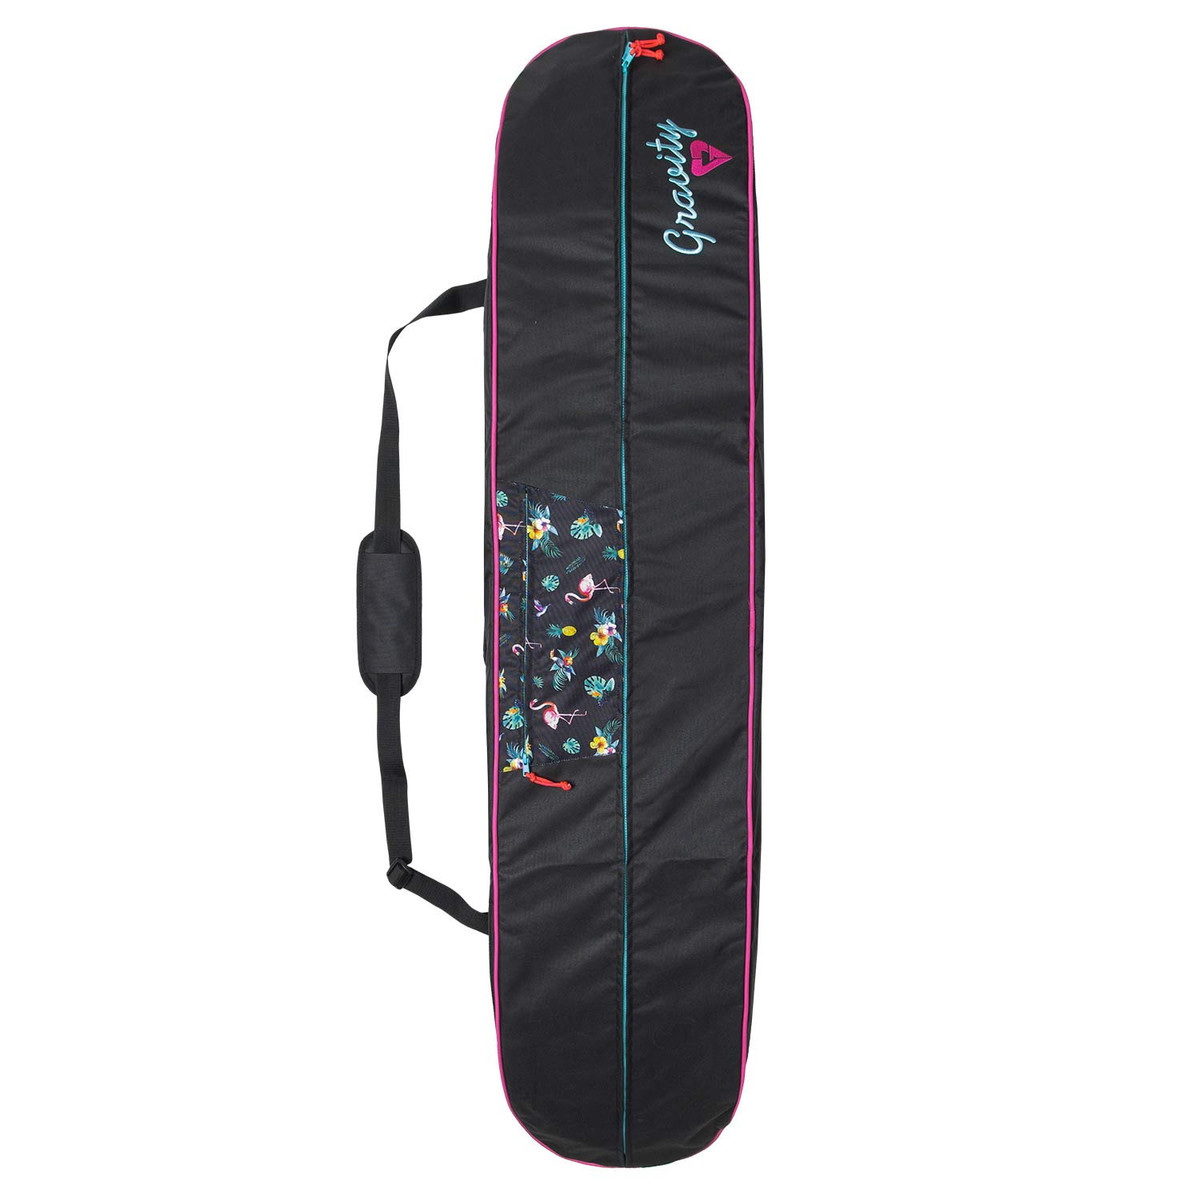 Obal na snowboard Gravity Ela 17/18 130 cm